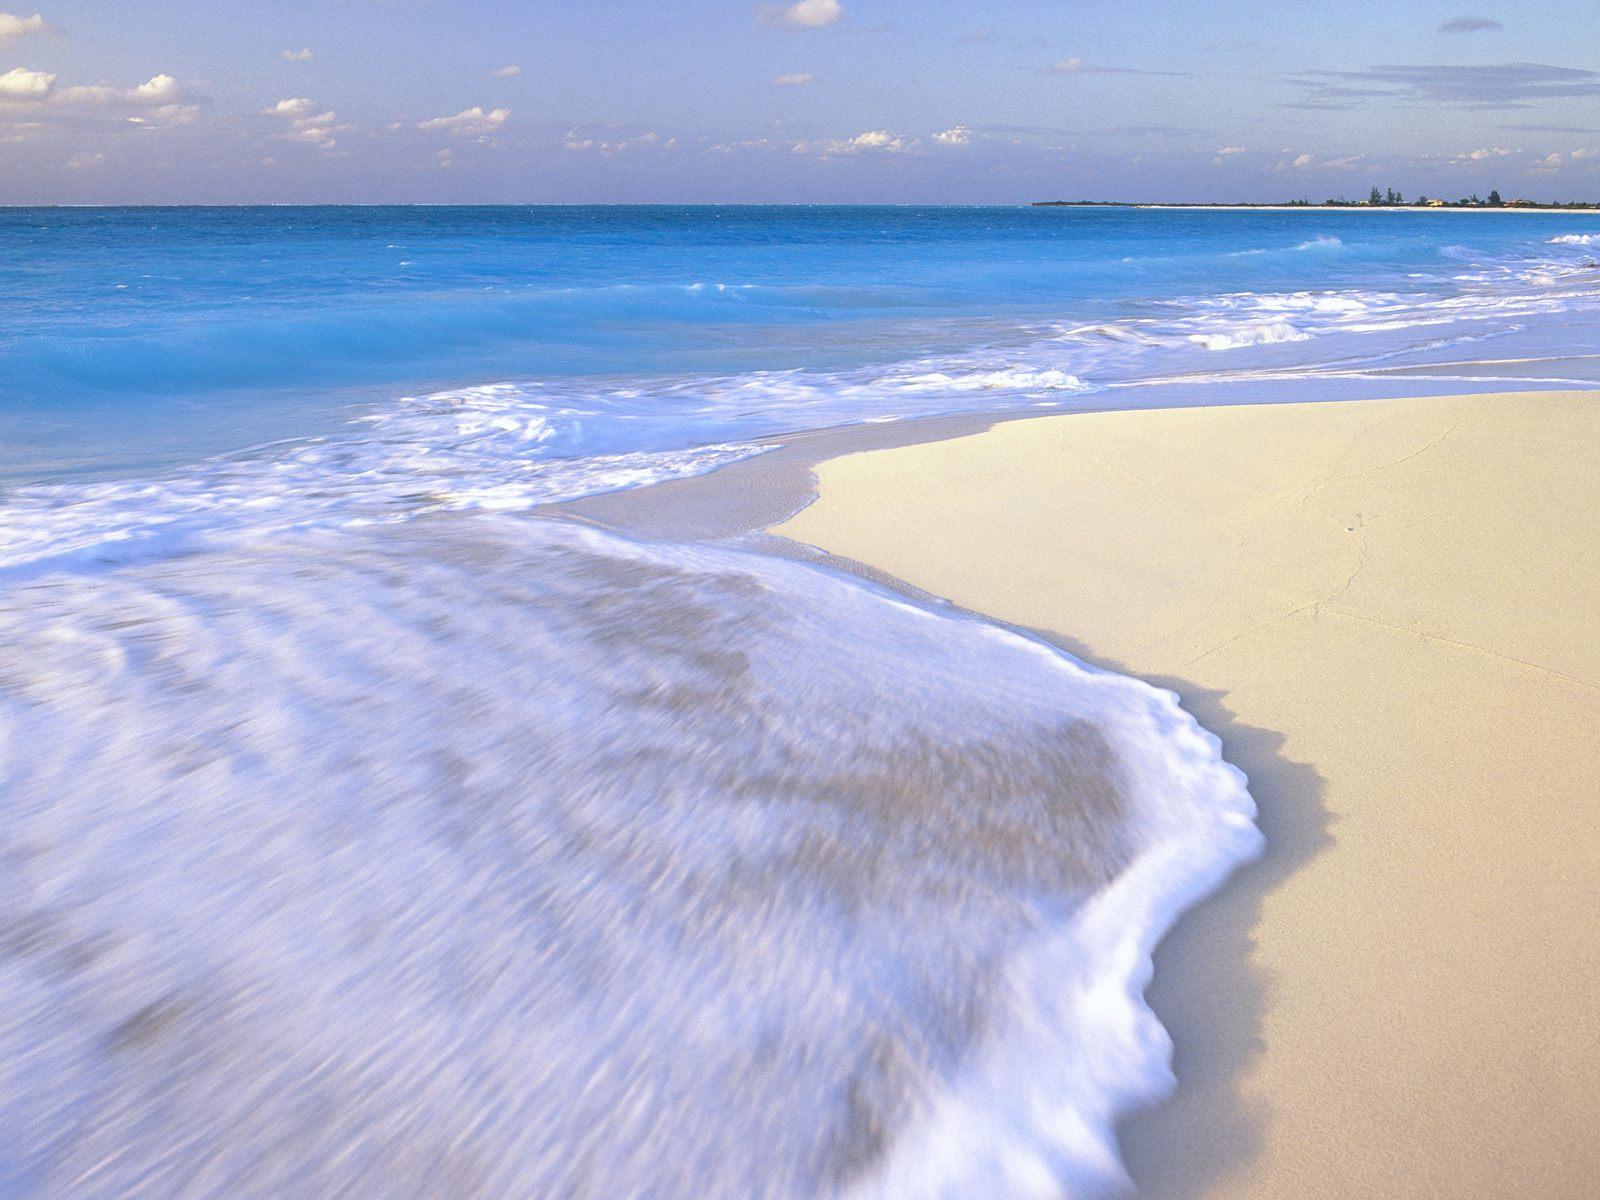 Pine Cay Beach, Turks And Caicos Islands